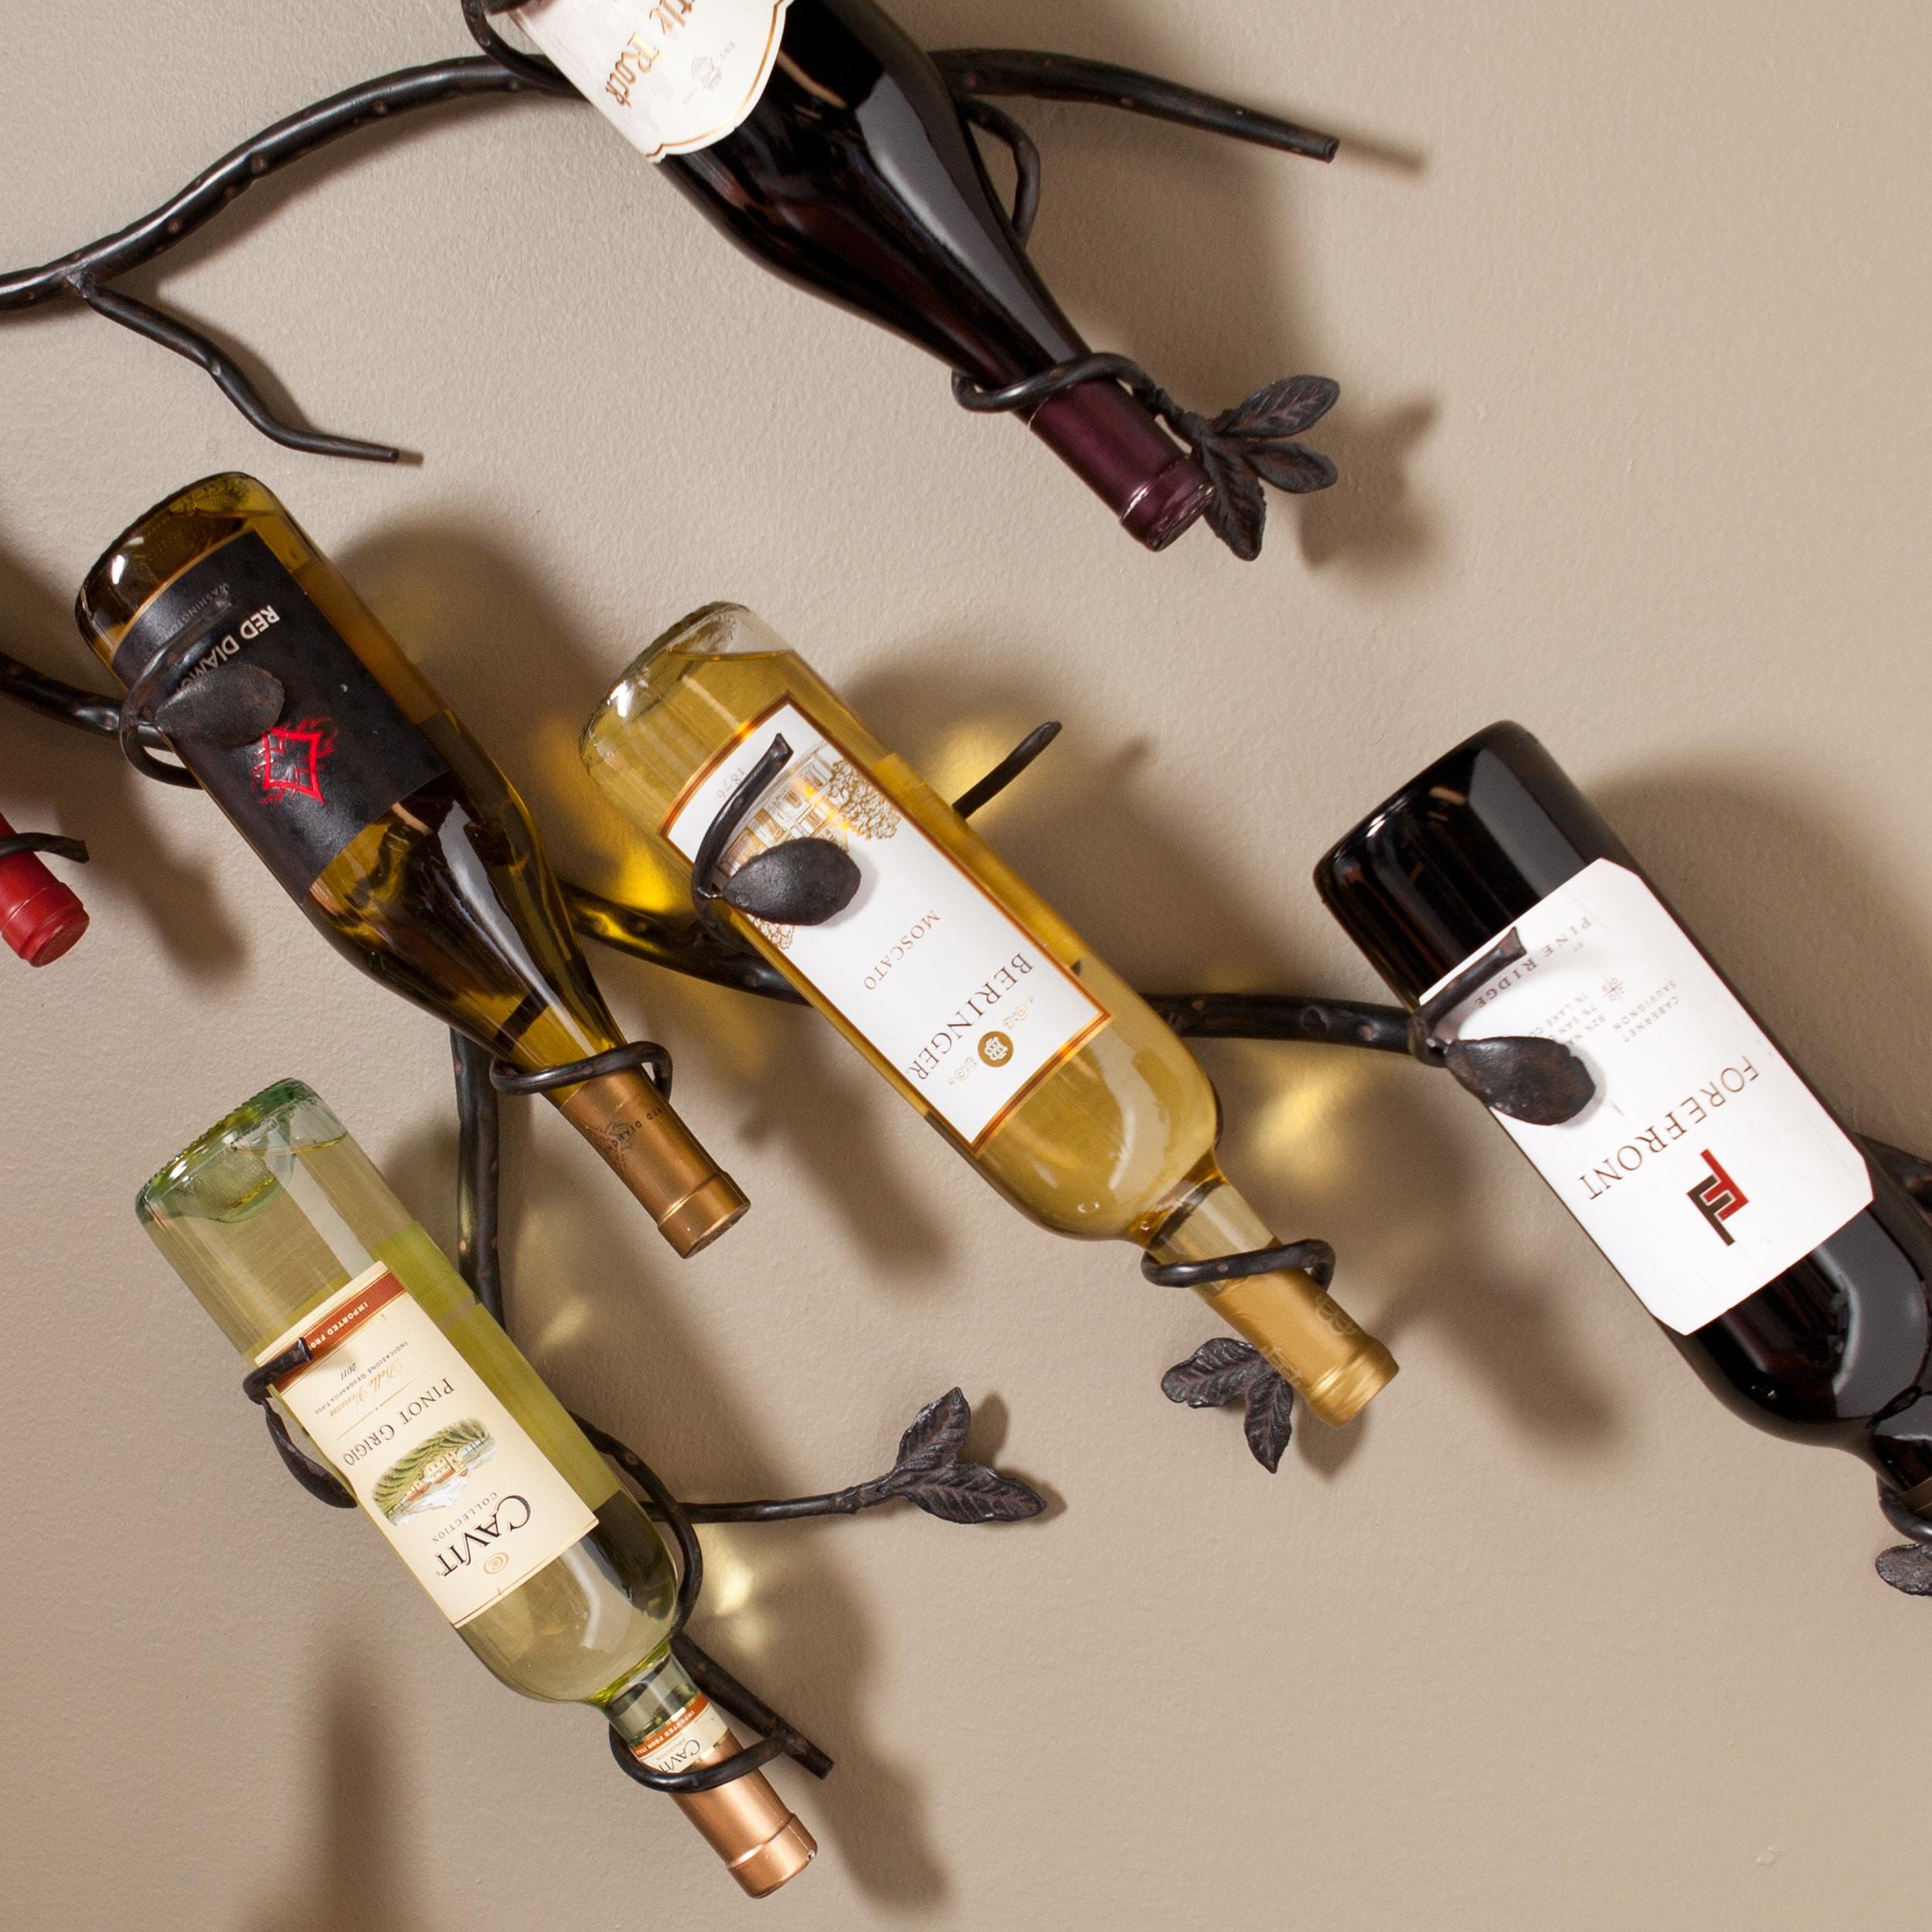 barrel cellars wine alexandria rack nicole mount anc wall